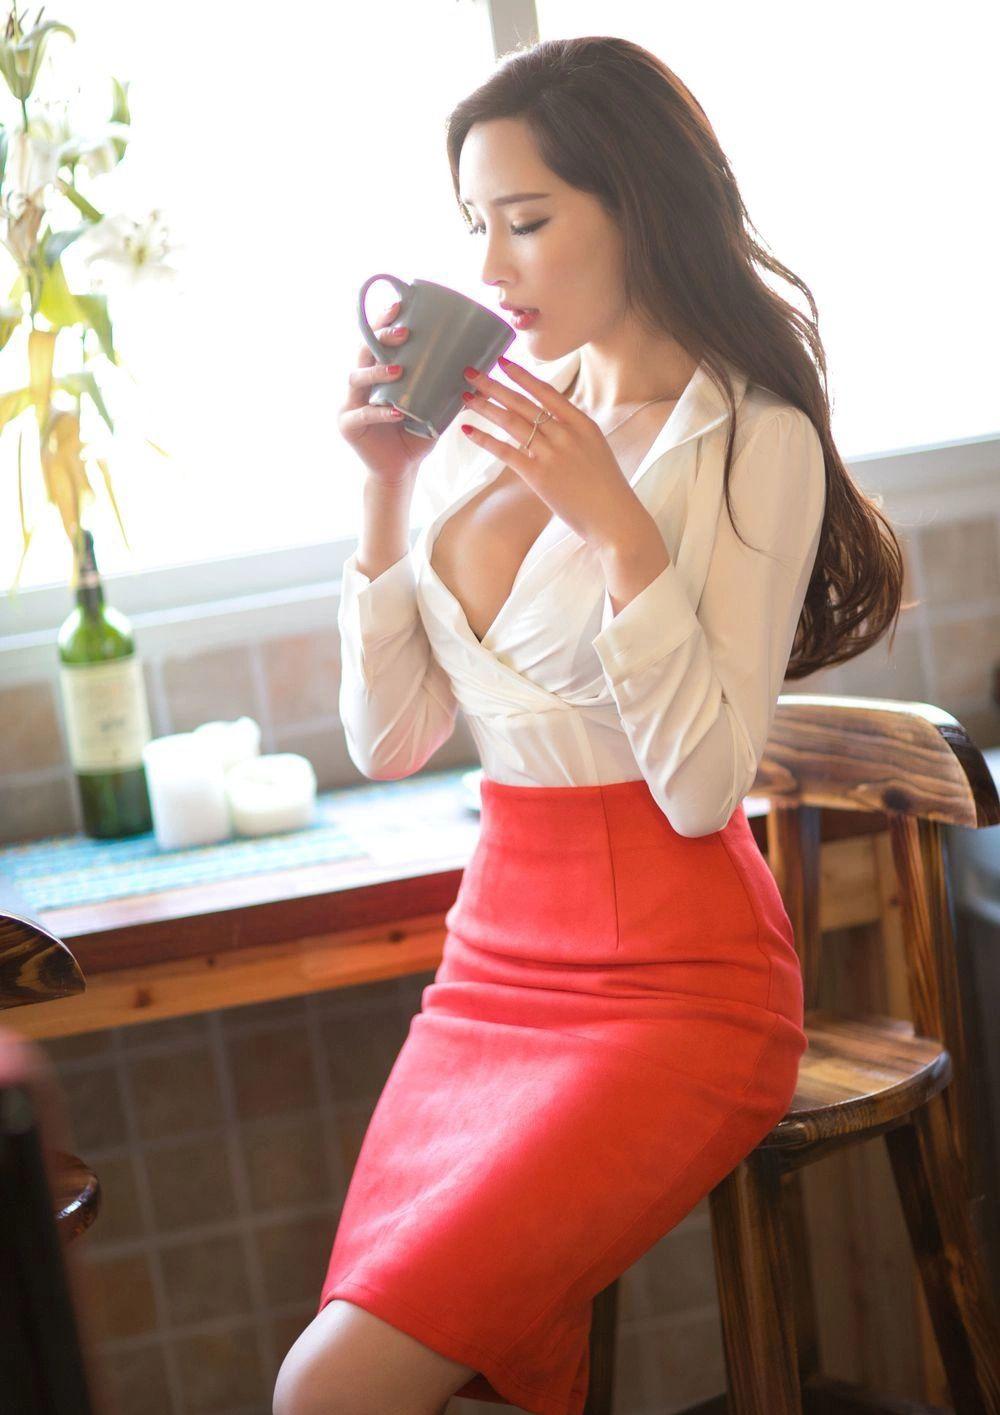 japan dating service floyd mayweather dating erica